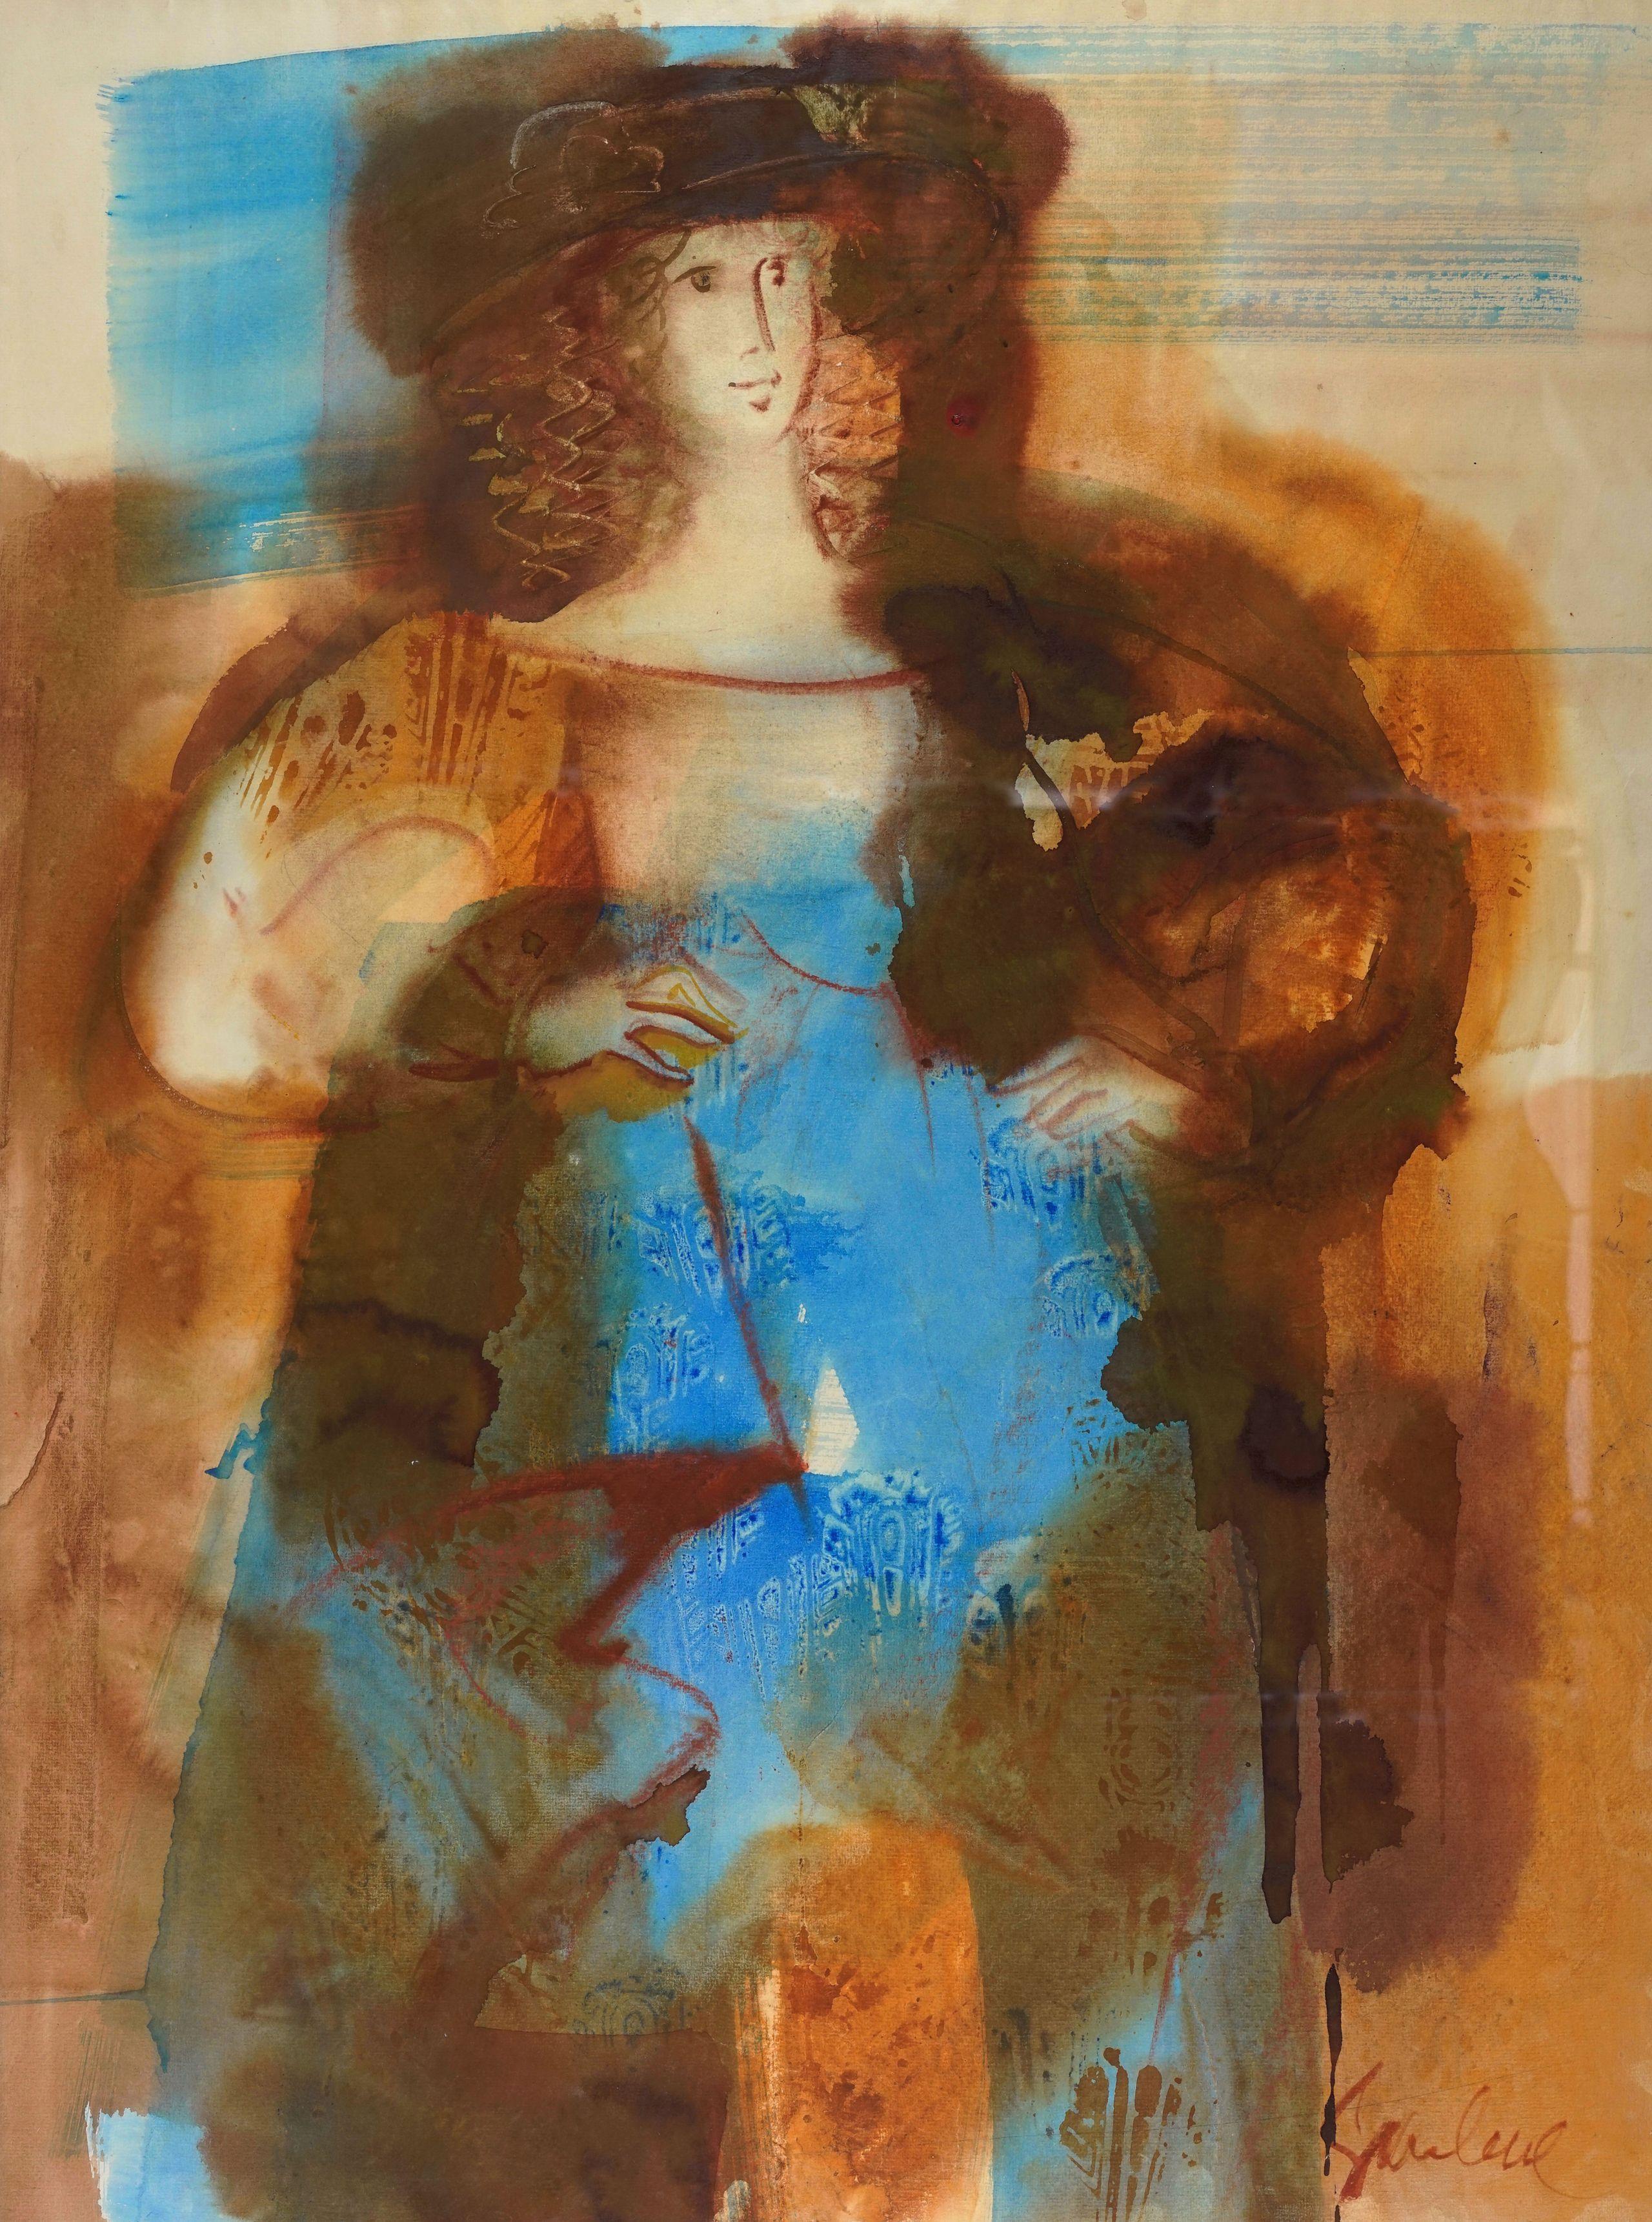 Lady in blue. 1982. Paper, watercolor, 100x73 cm